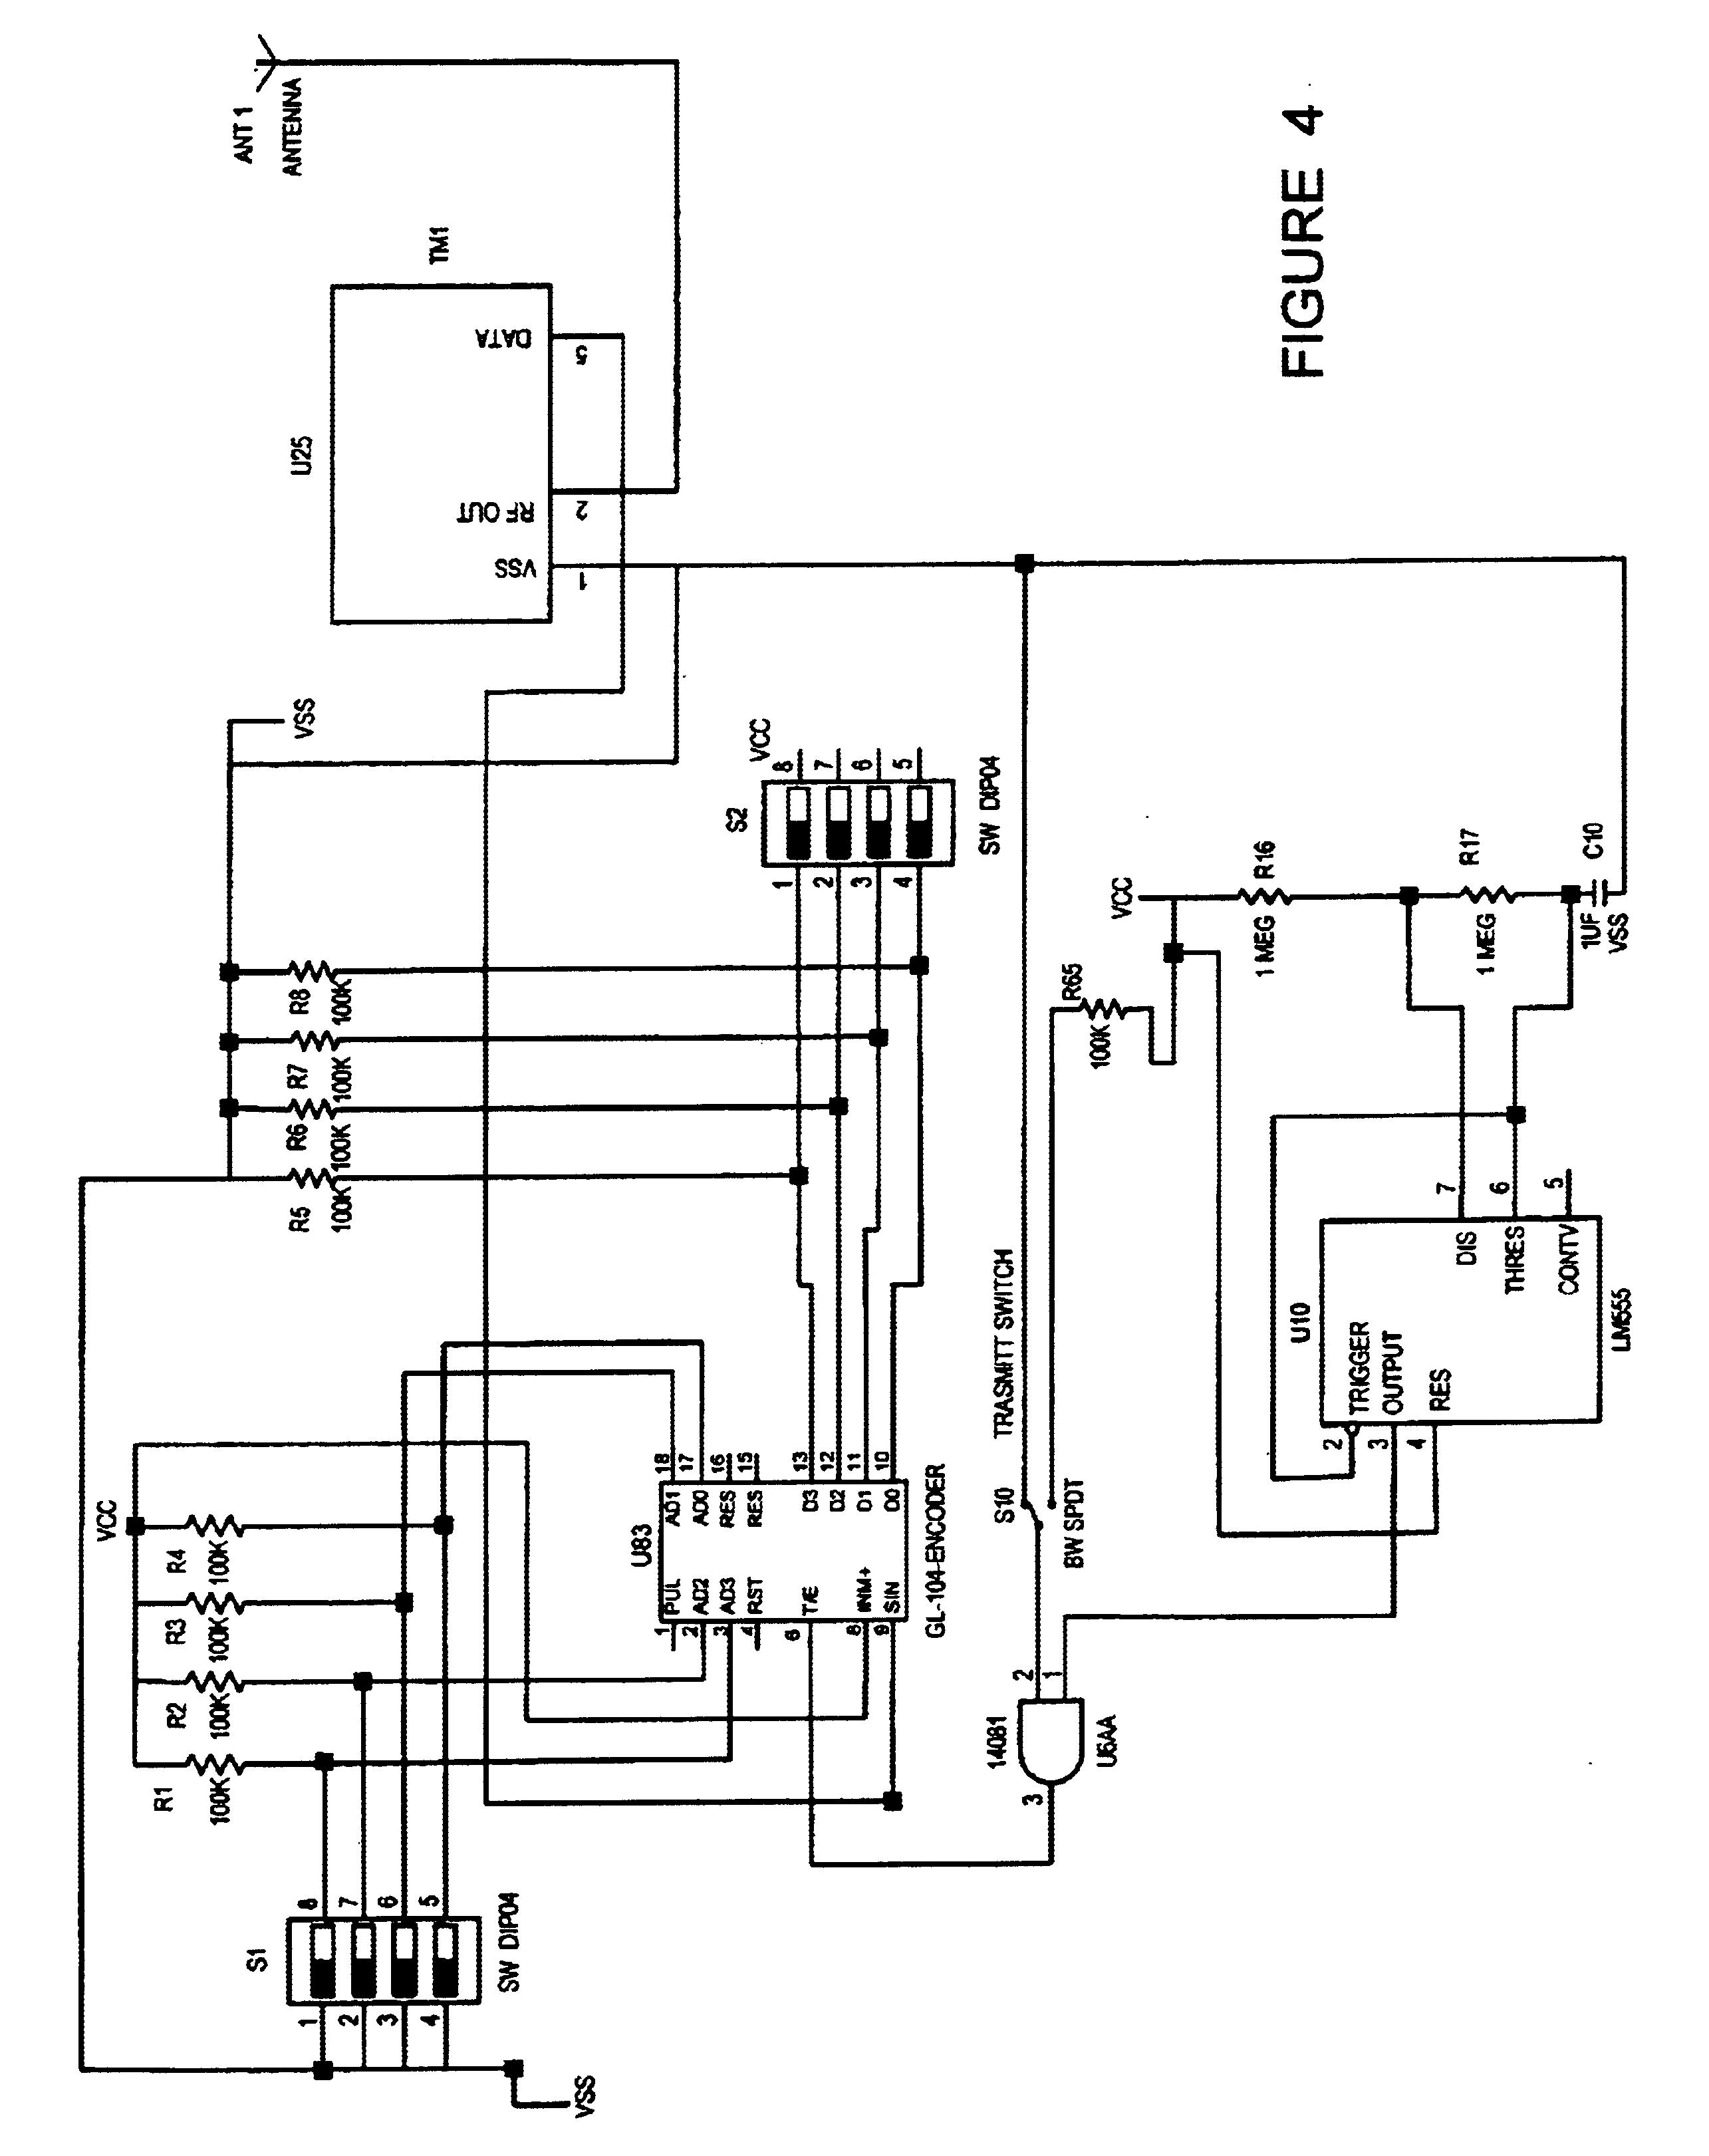 patent us6836221 railroad advance warning system patents Scott Diagram patent drawing